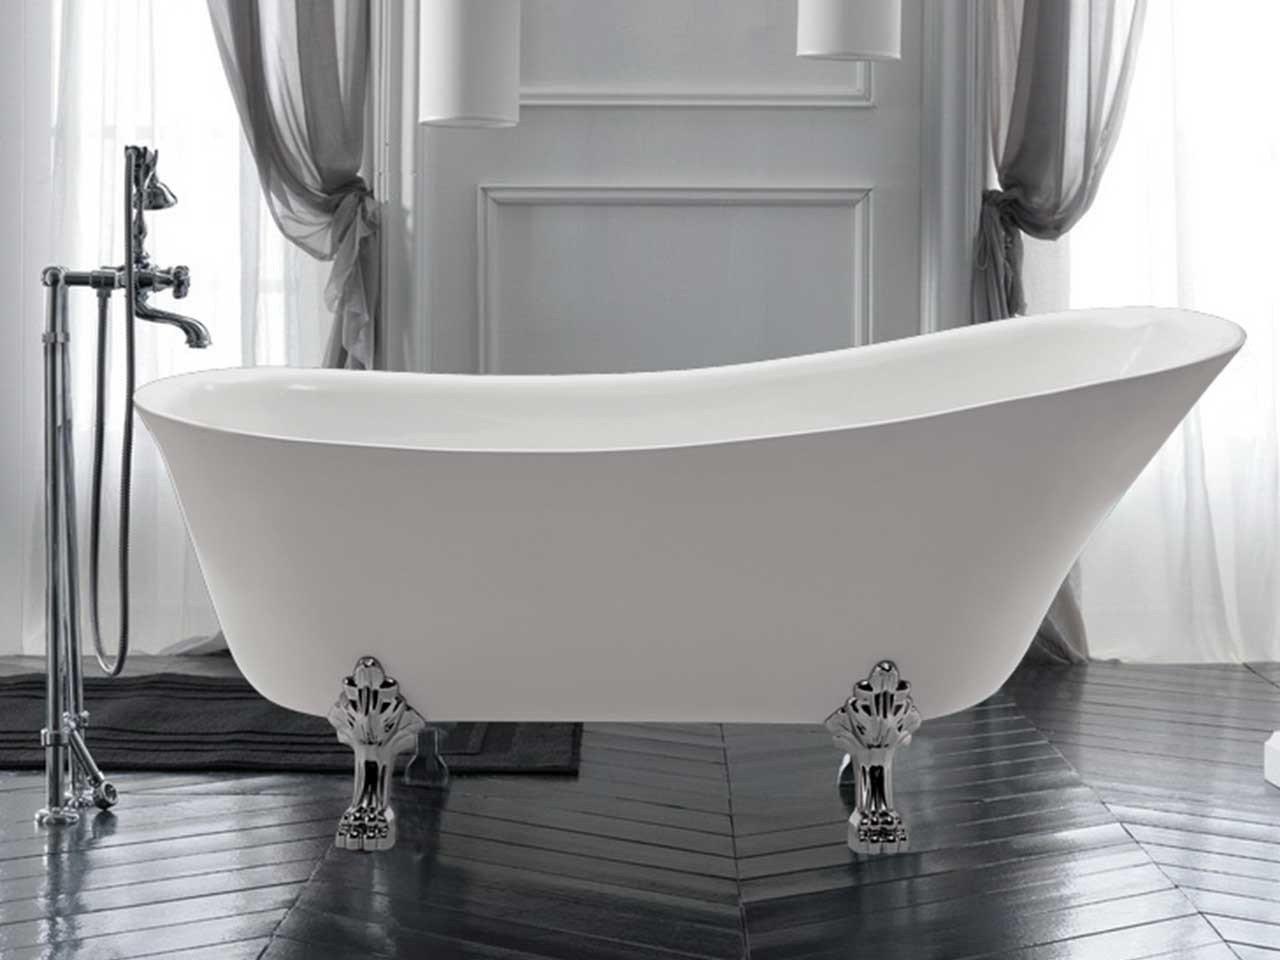 Vasca deco 1700x720 piedi inclusi iperceramica - Vasca da bagno con piedini ...